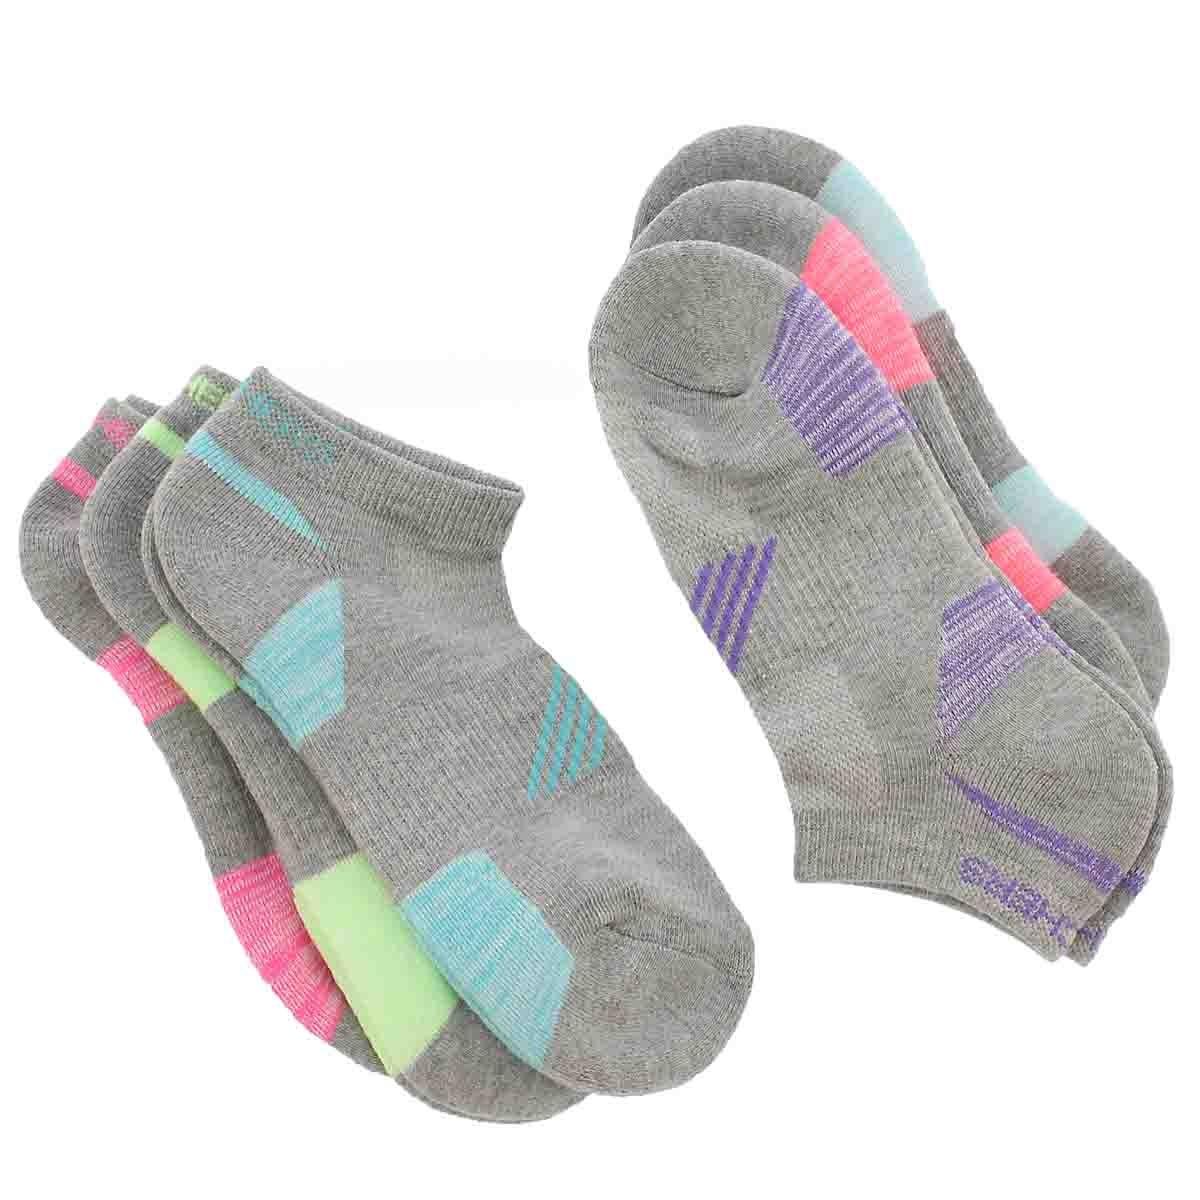 Women's LOW CUT HALF TERRY gry mlti socks 6 pk